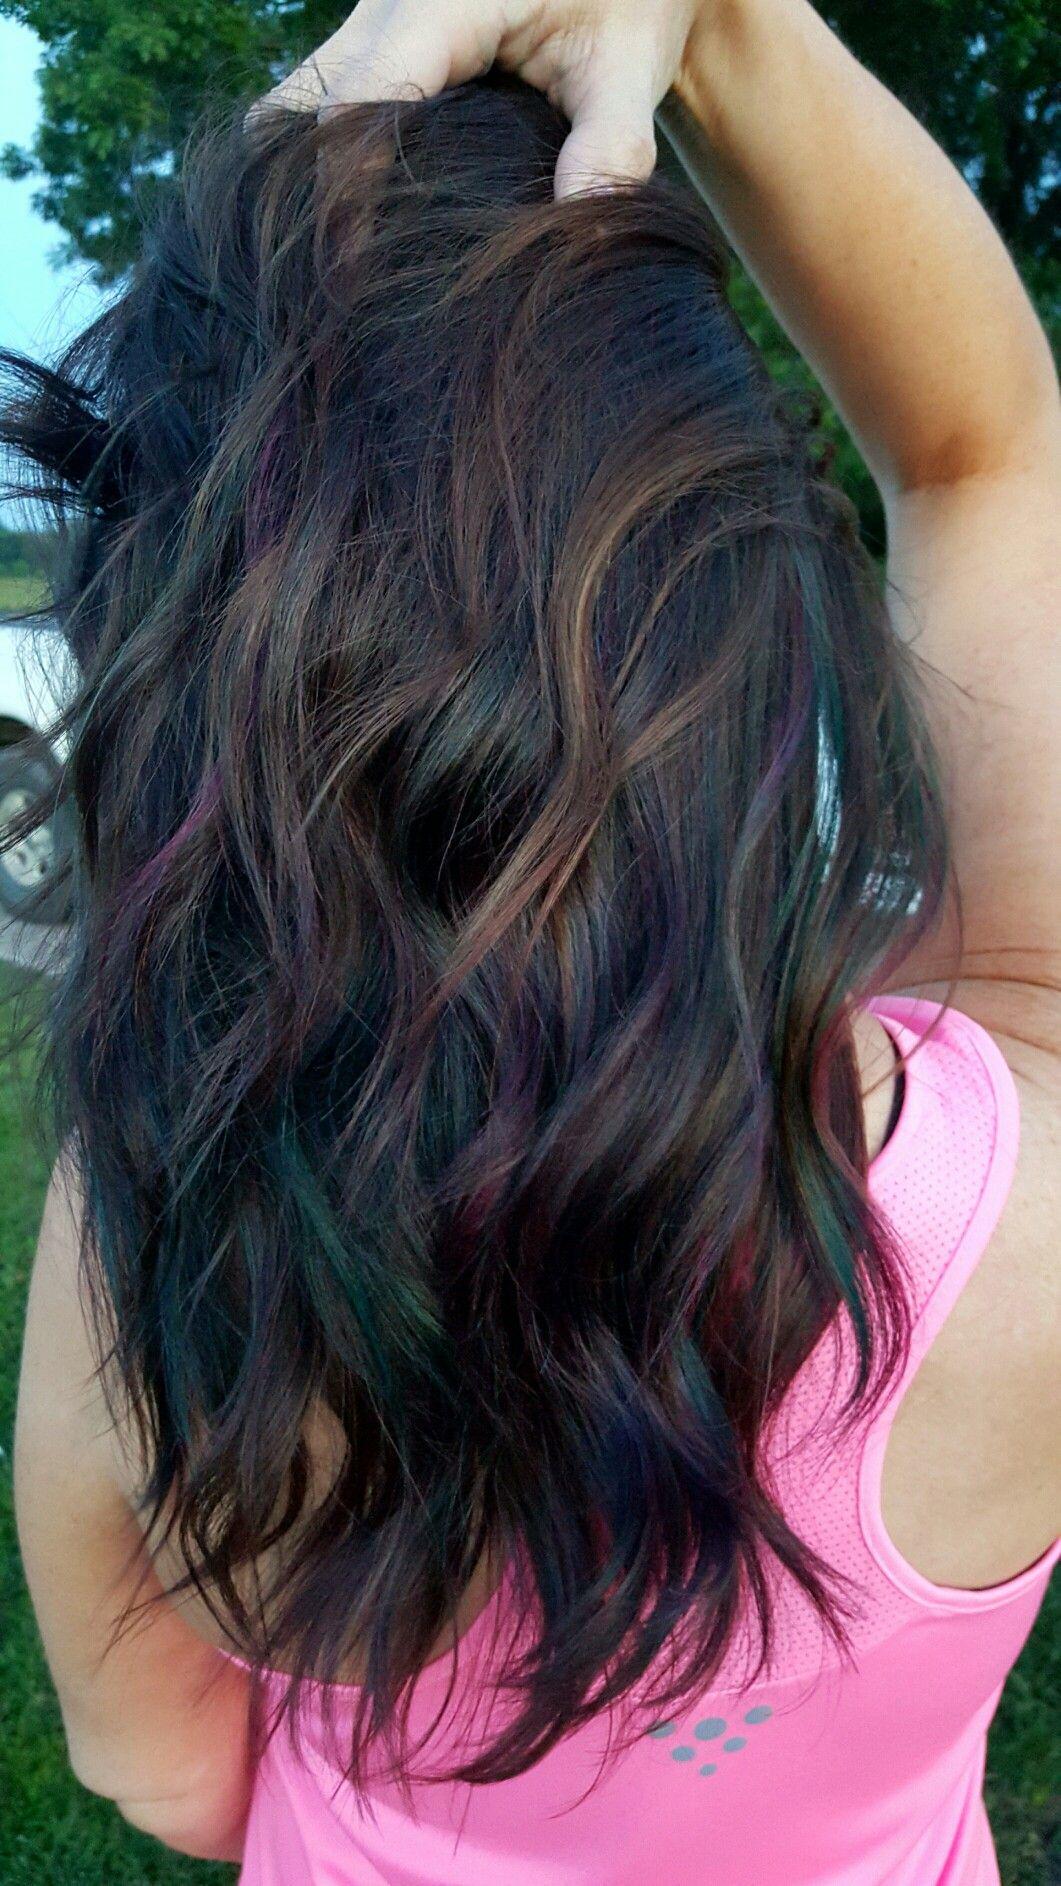 Oil Slick Hair Color Oilslickhair Beautyful Pinterest Hair